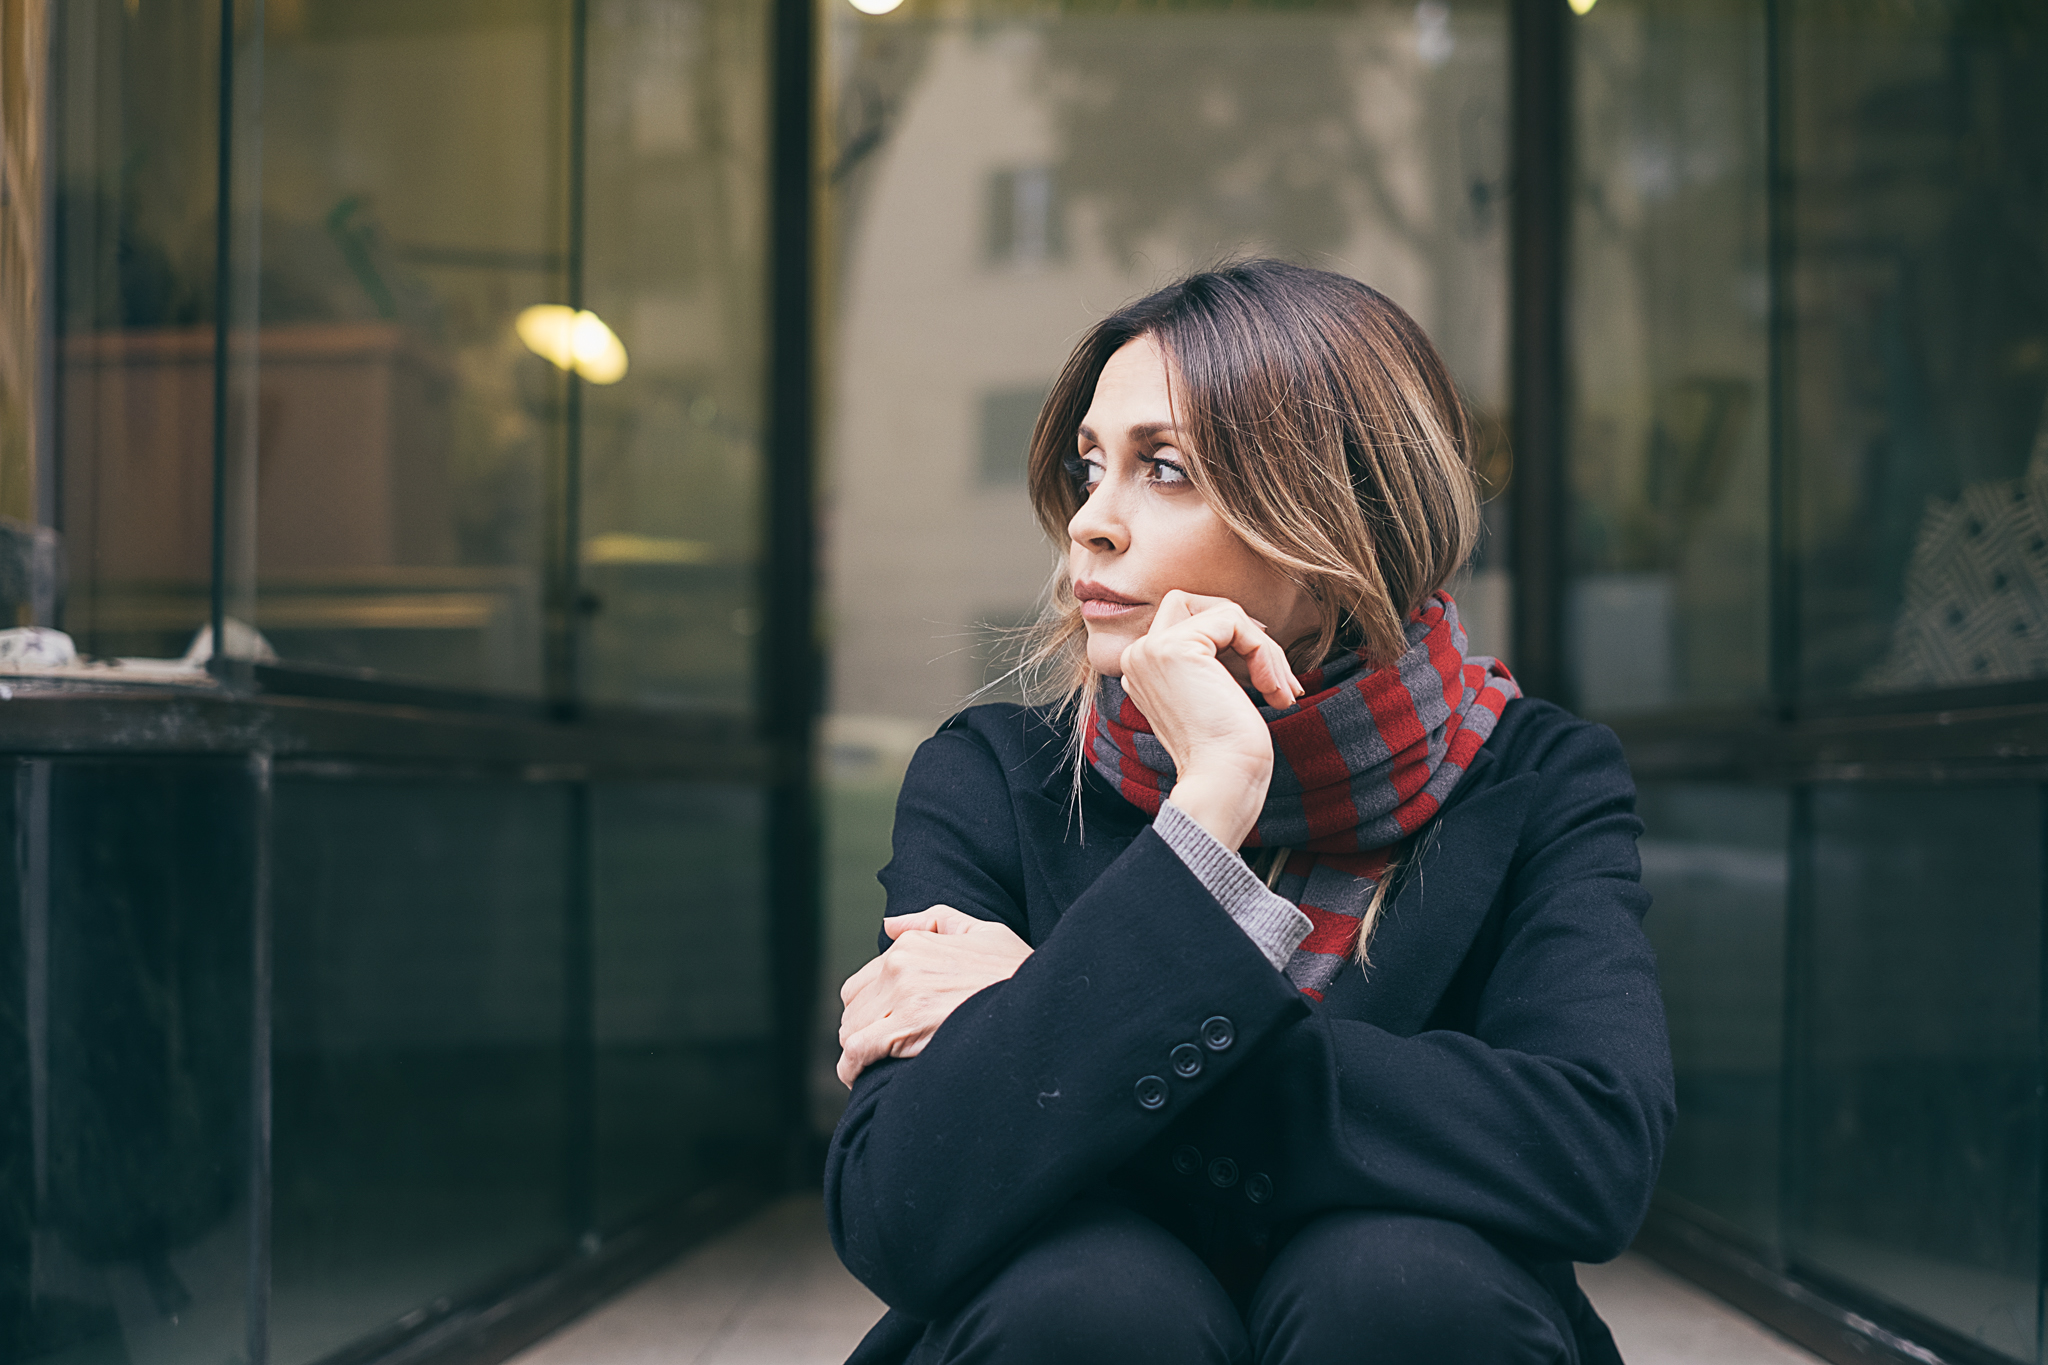 Ritratti_Elda Alvigini2017 (1)